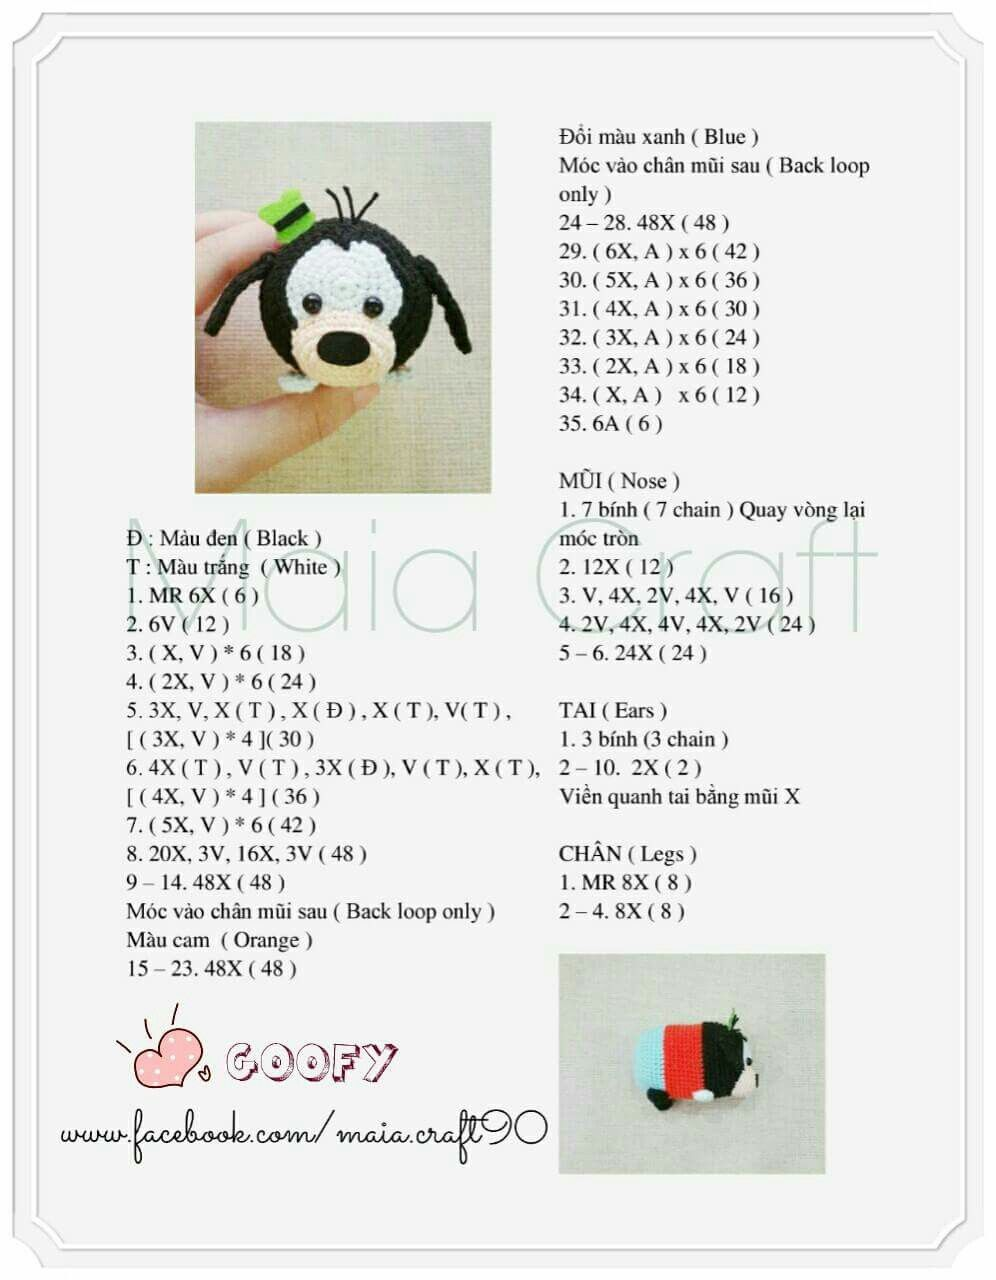 Crochet Tsum Tsum Groopy   ชอบ   Pinterest   Crochet, Amigurumi and ...